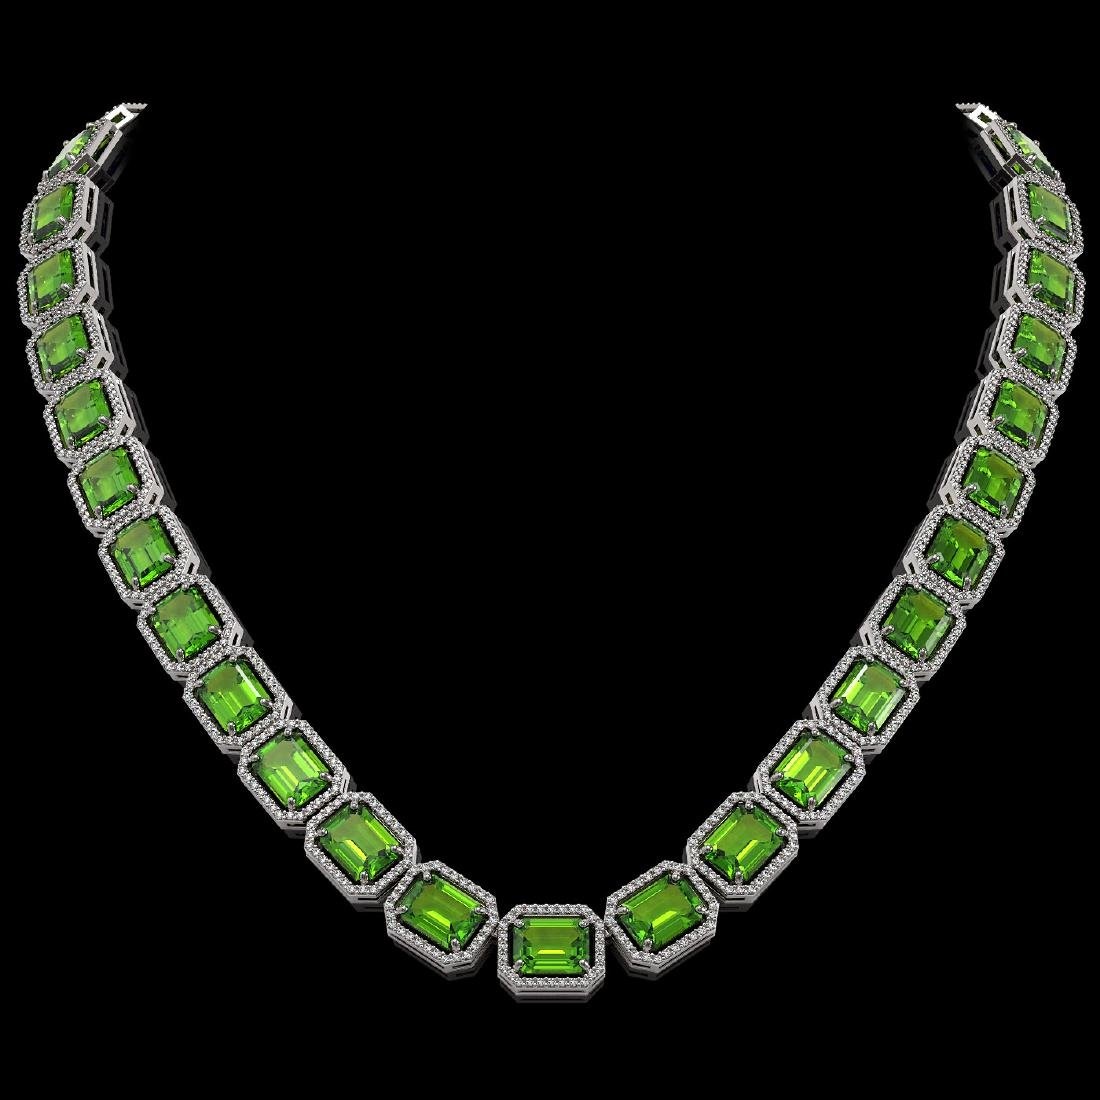 73.41 CTW Peridot & Diamond Halo Necklace 10K White